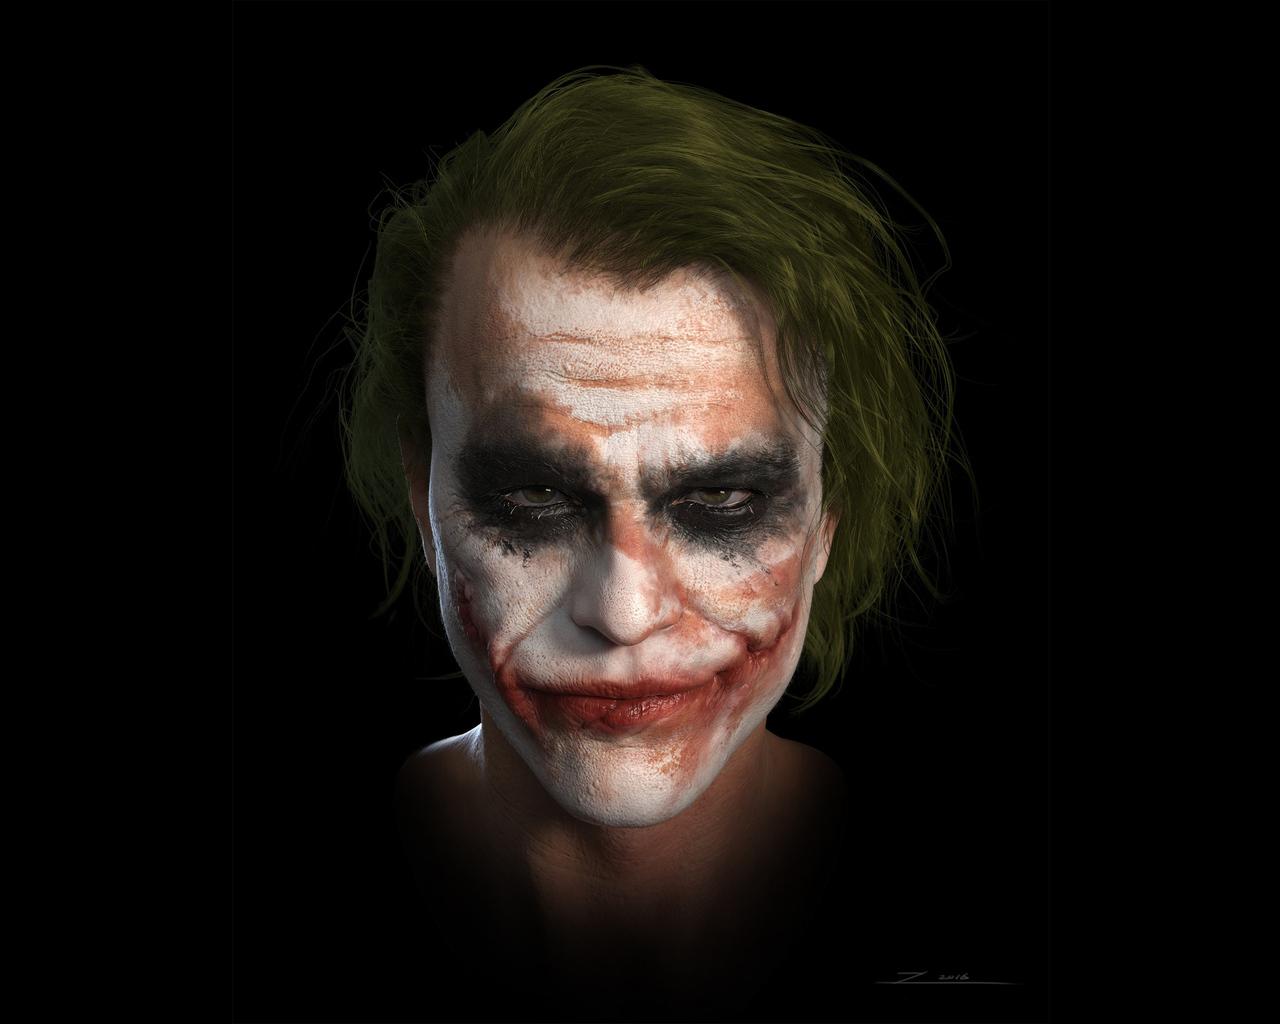 1280x1024 Joker Heath Ledger 4k Art 1280x1024 Resolution ...